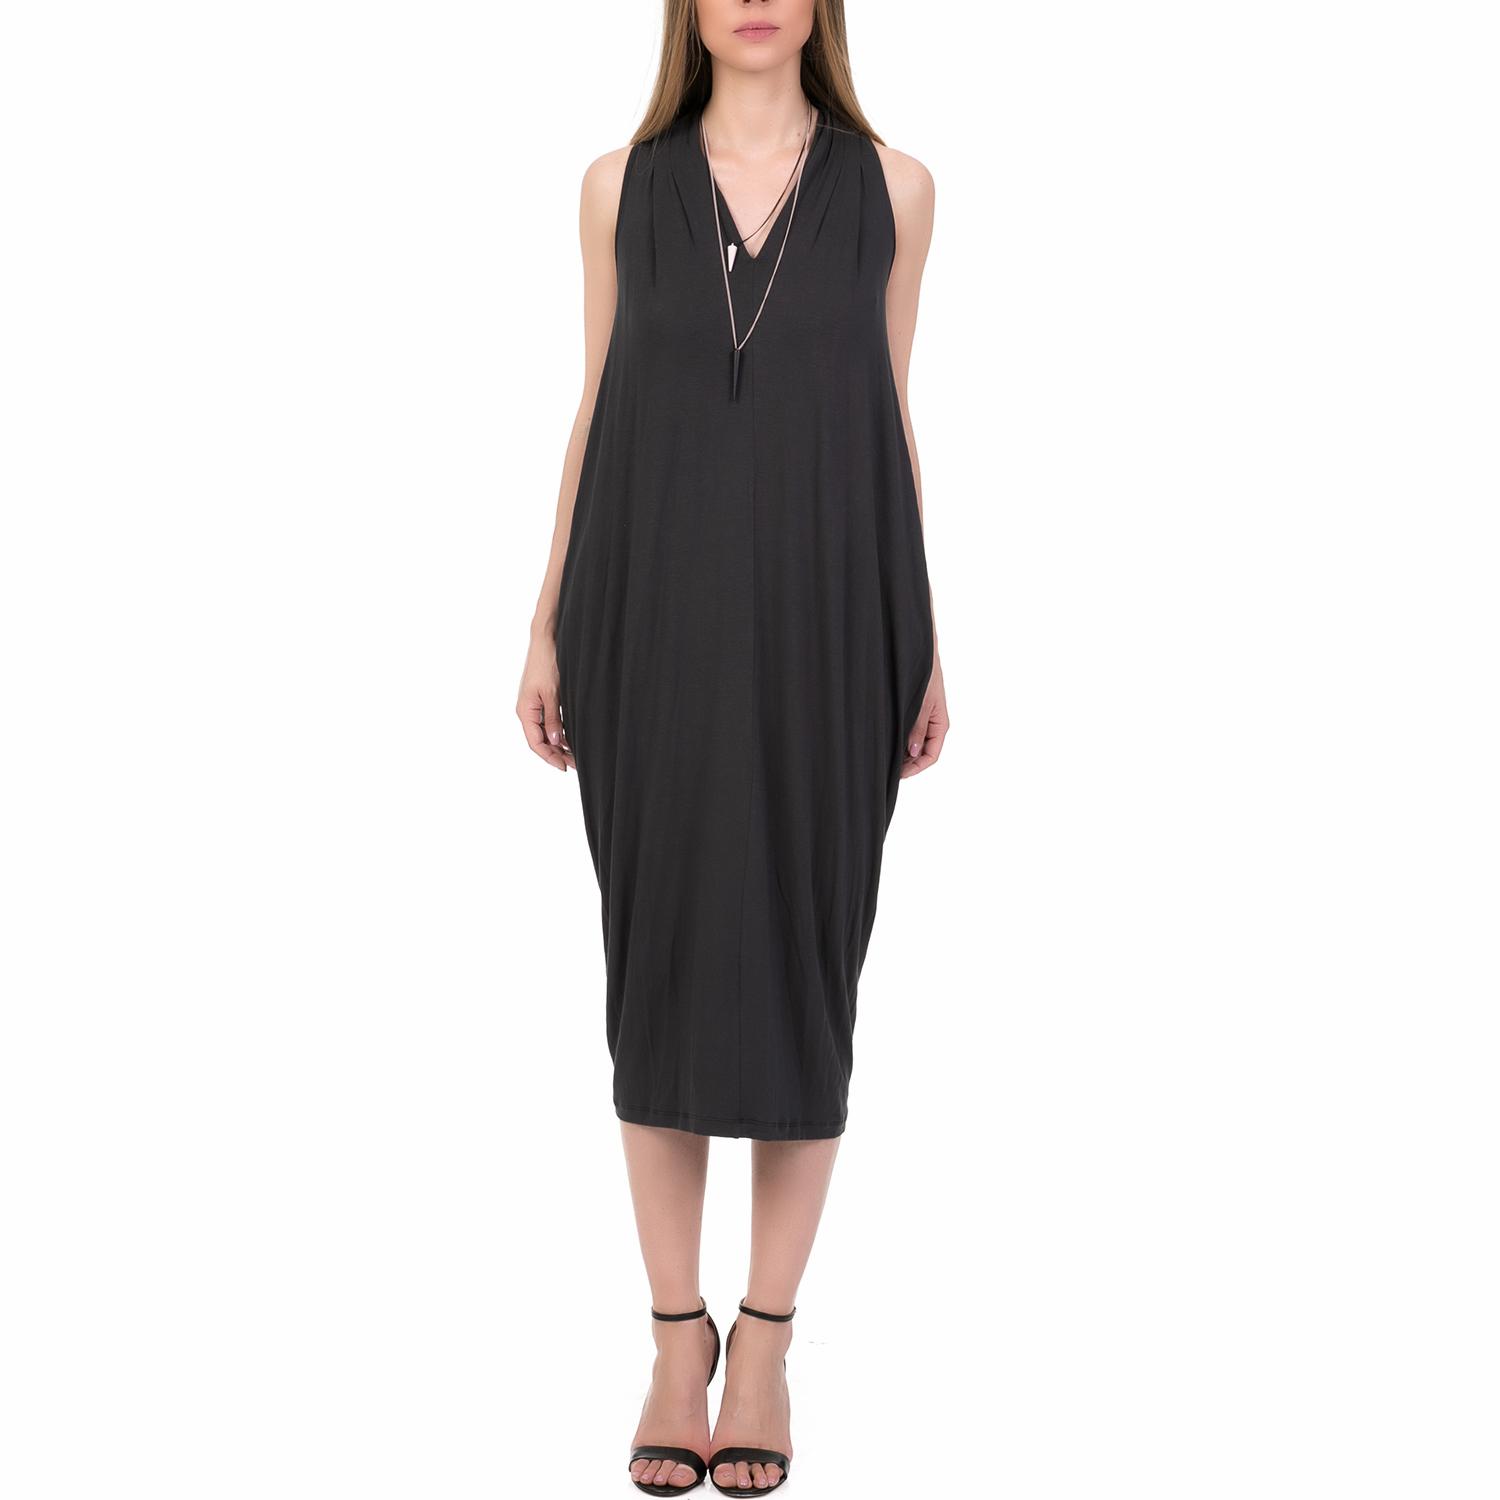 2d8c64bac5b3  ALE - Γυναικείο μίντι φόρεμα  ALE ανθρακί.